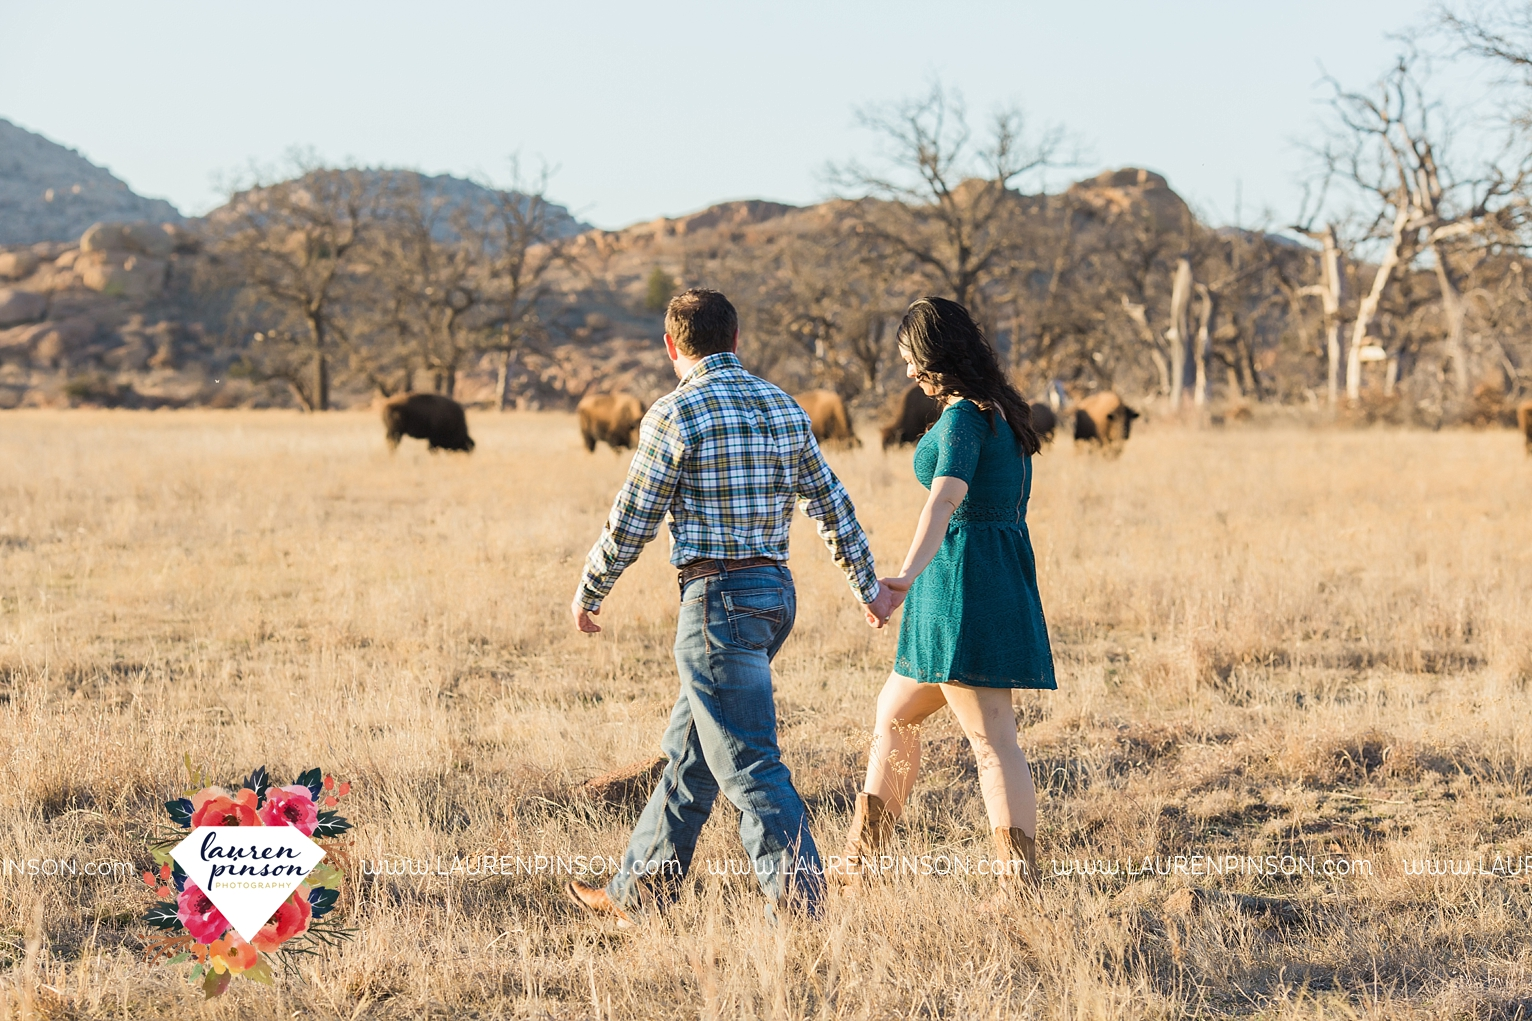 wichita-falls-texas-engagement-photographer-wedding-oklahoma-lawton-wichita-mountains-refuge-outdoors-mountains-engaged_2061.jpg